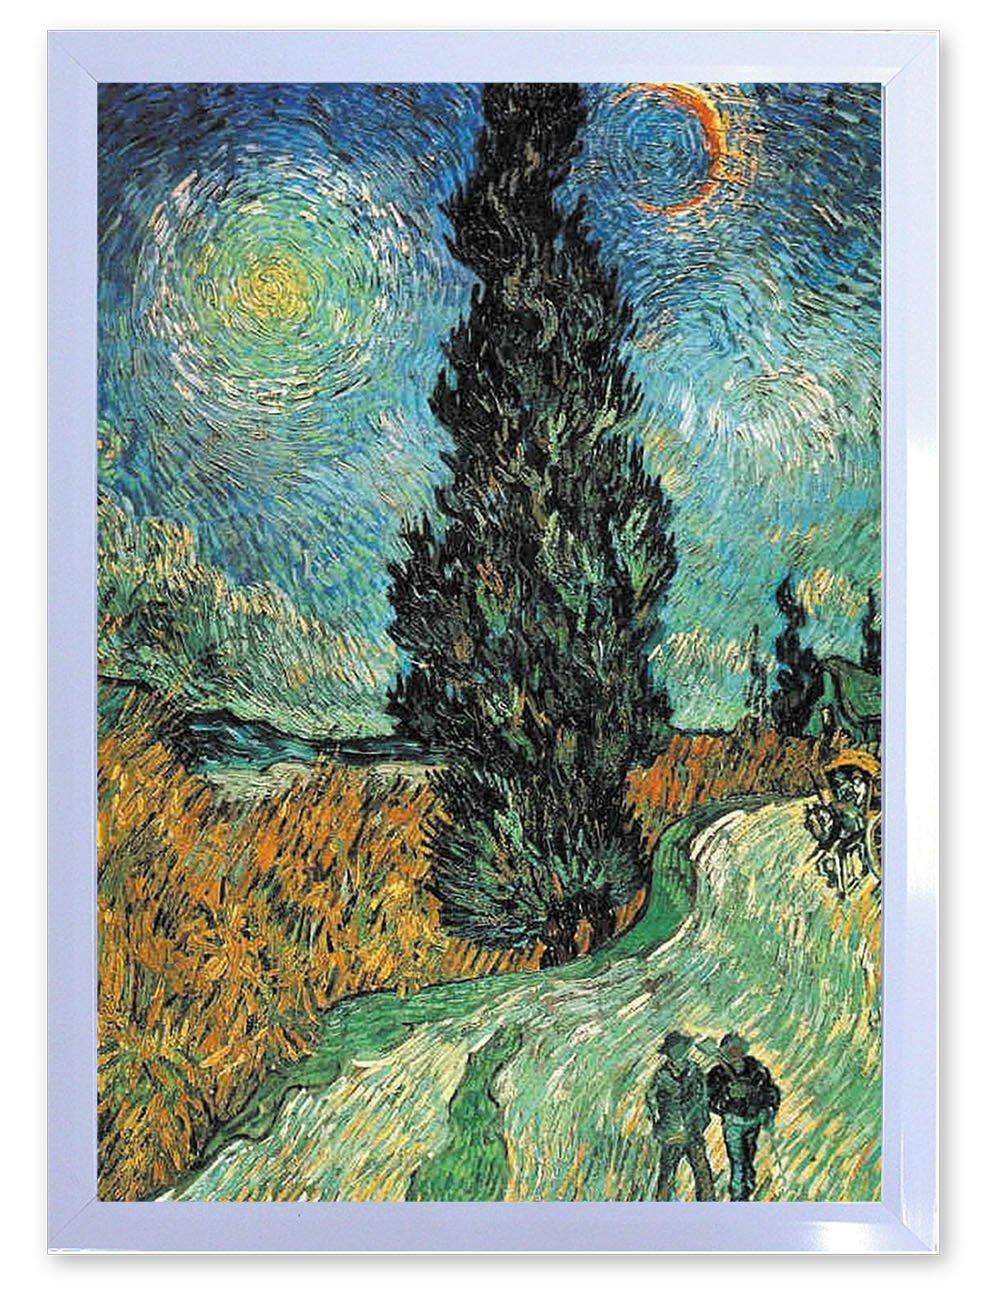 【DXポスター】フィンセントファンコッホのアートポスター フレーム付きVincent Willem van GoghP-A2-FIN-GOGH-0009-bk P-A2-FIN-GOGH-0009-bk B073SD3TWZ A2サイズ(59.4cm×42cm)+ブラックフレーム A2サイズ(59.4cm×42cm)+ブラックフレーム